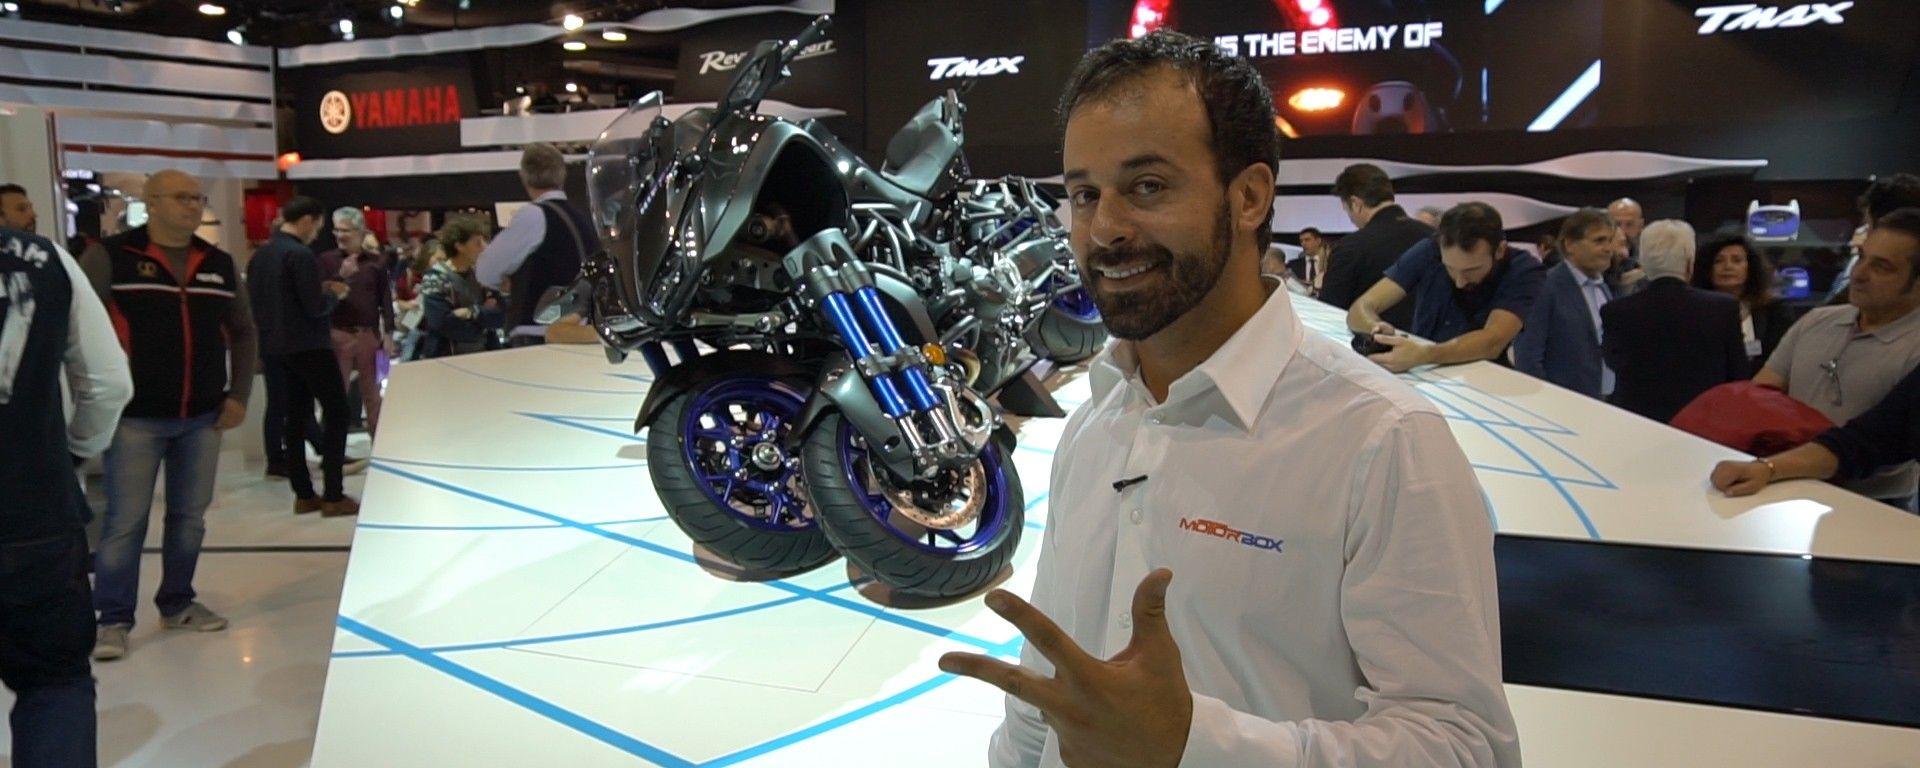 Yamaha Niken: la moto a tre ruote a Eicma 2017 [VIDEO]